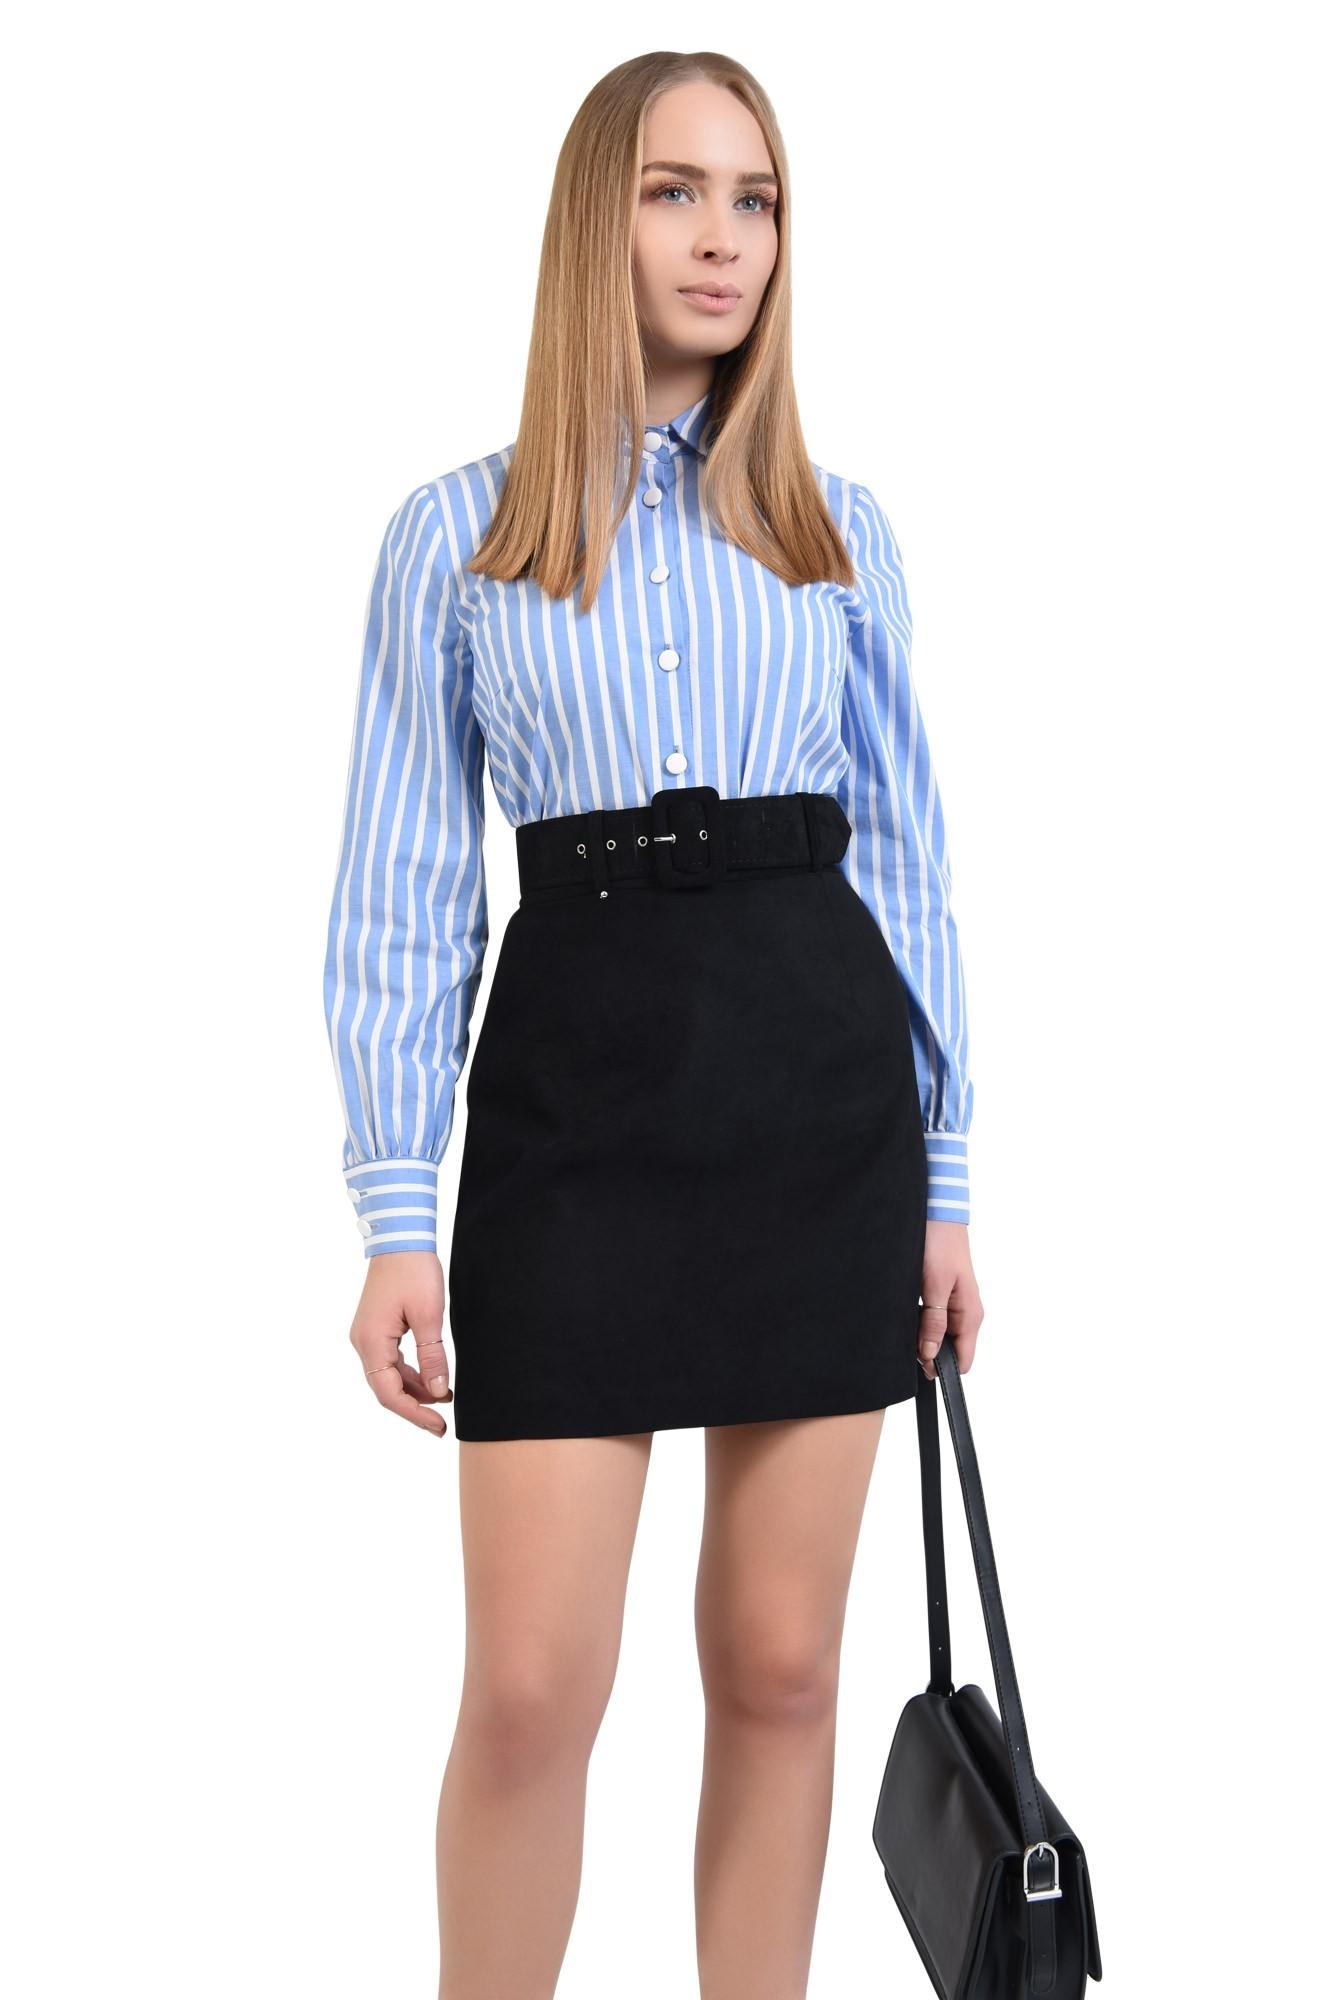 2 - fusta casual, scurta, croi evazat scurt, neagra